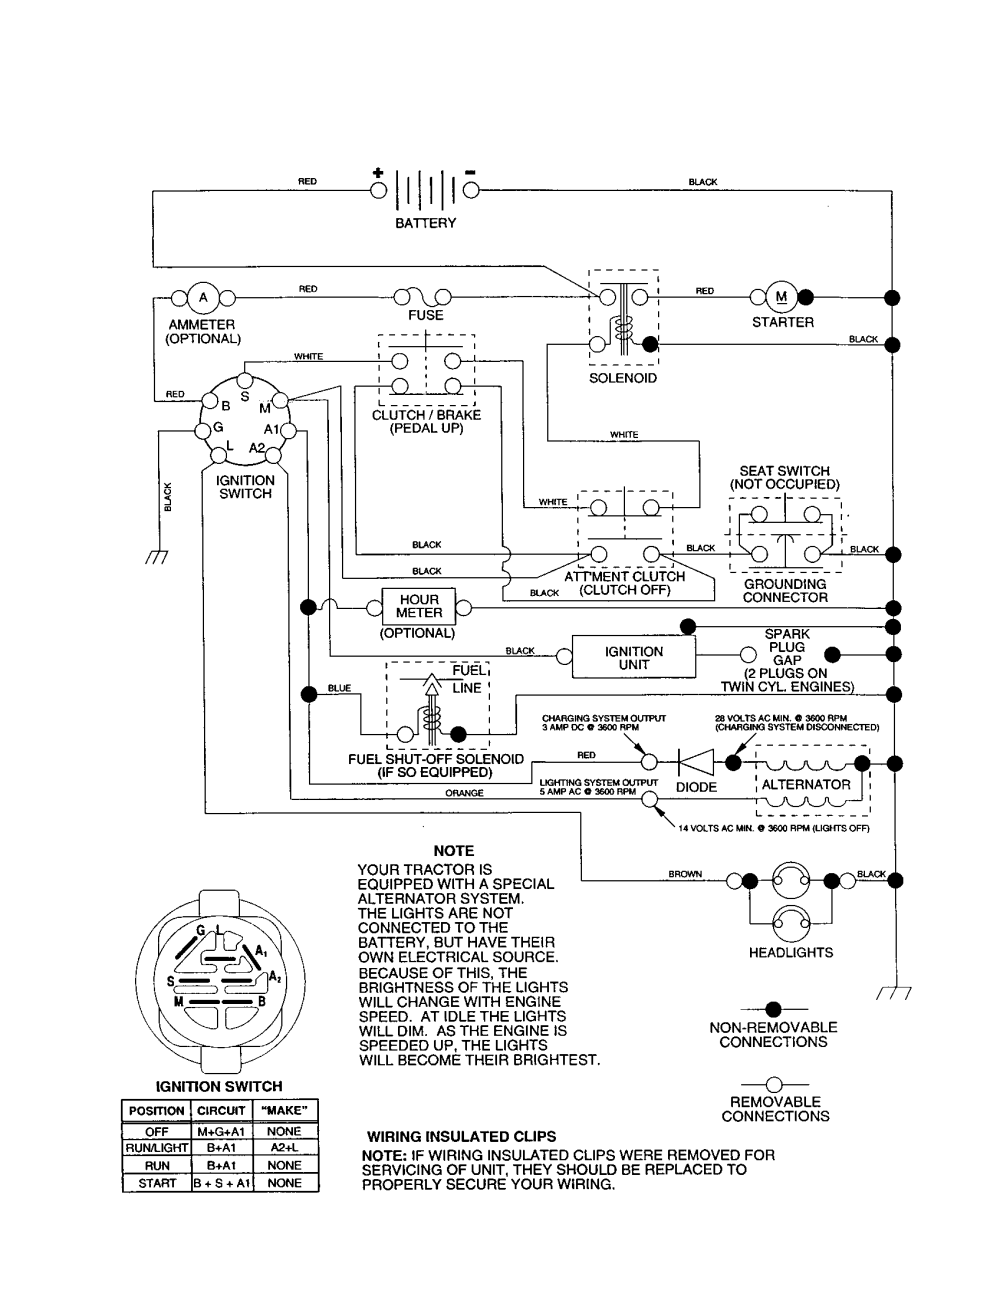 medium resolution of brigg and stratton engine wiring diagram